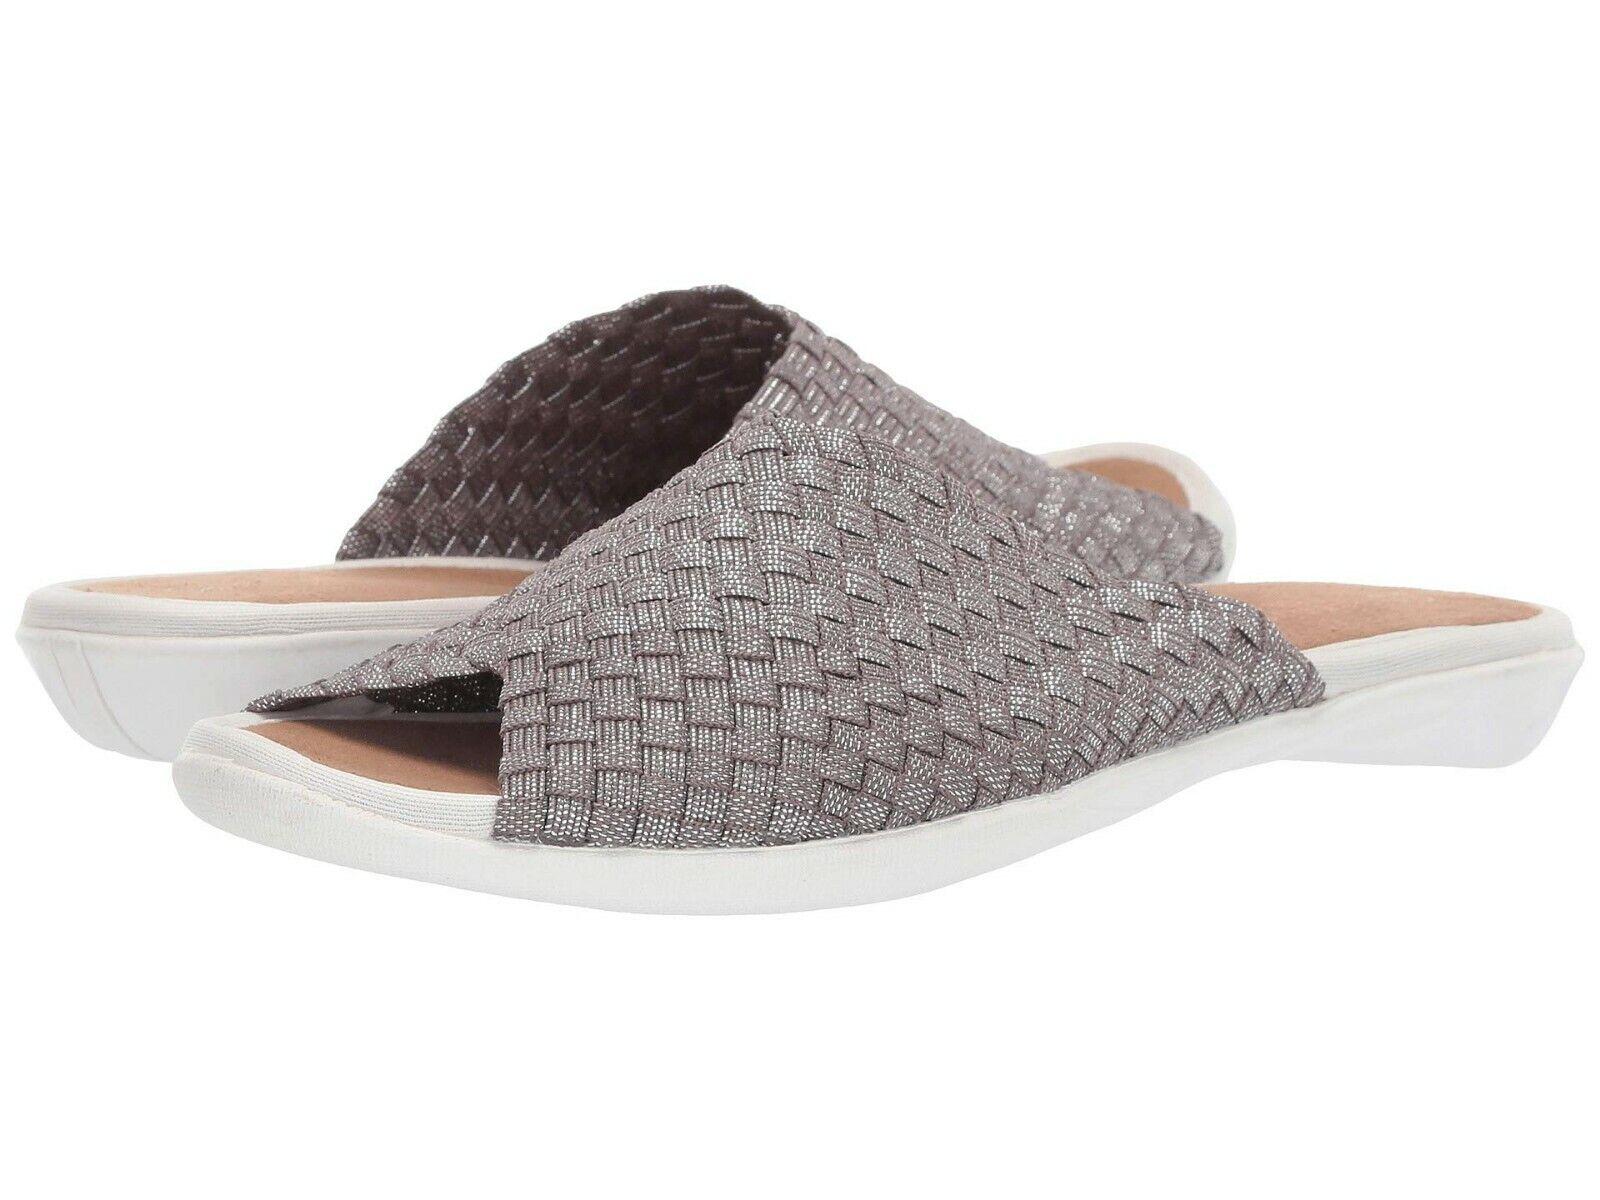 Chaussures femmes Bernie Mev Bon Bon Slip on Slide Sandale fumée SCINTILLANT  NEUF